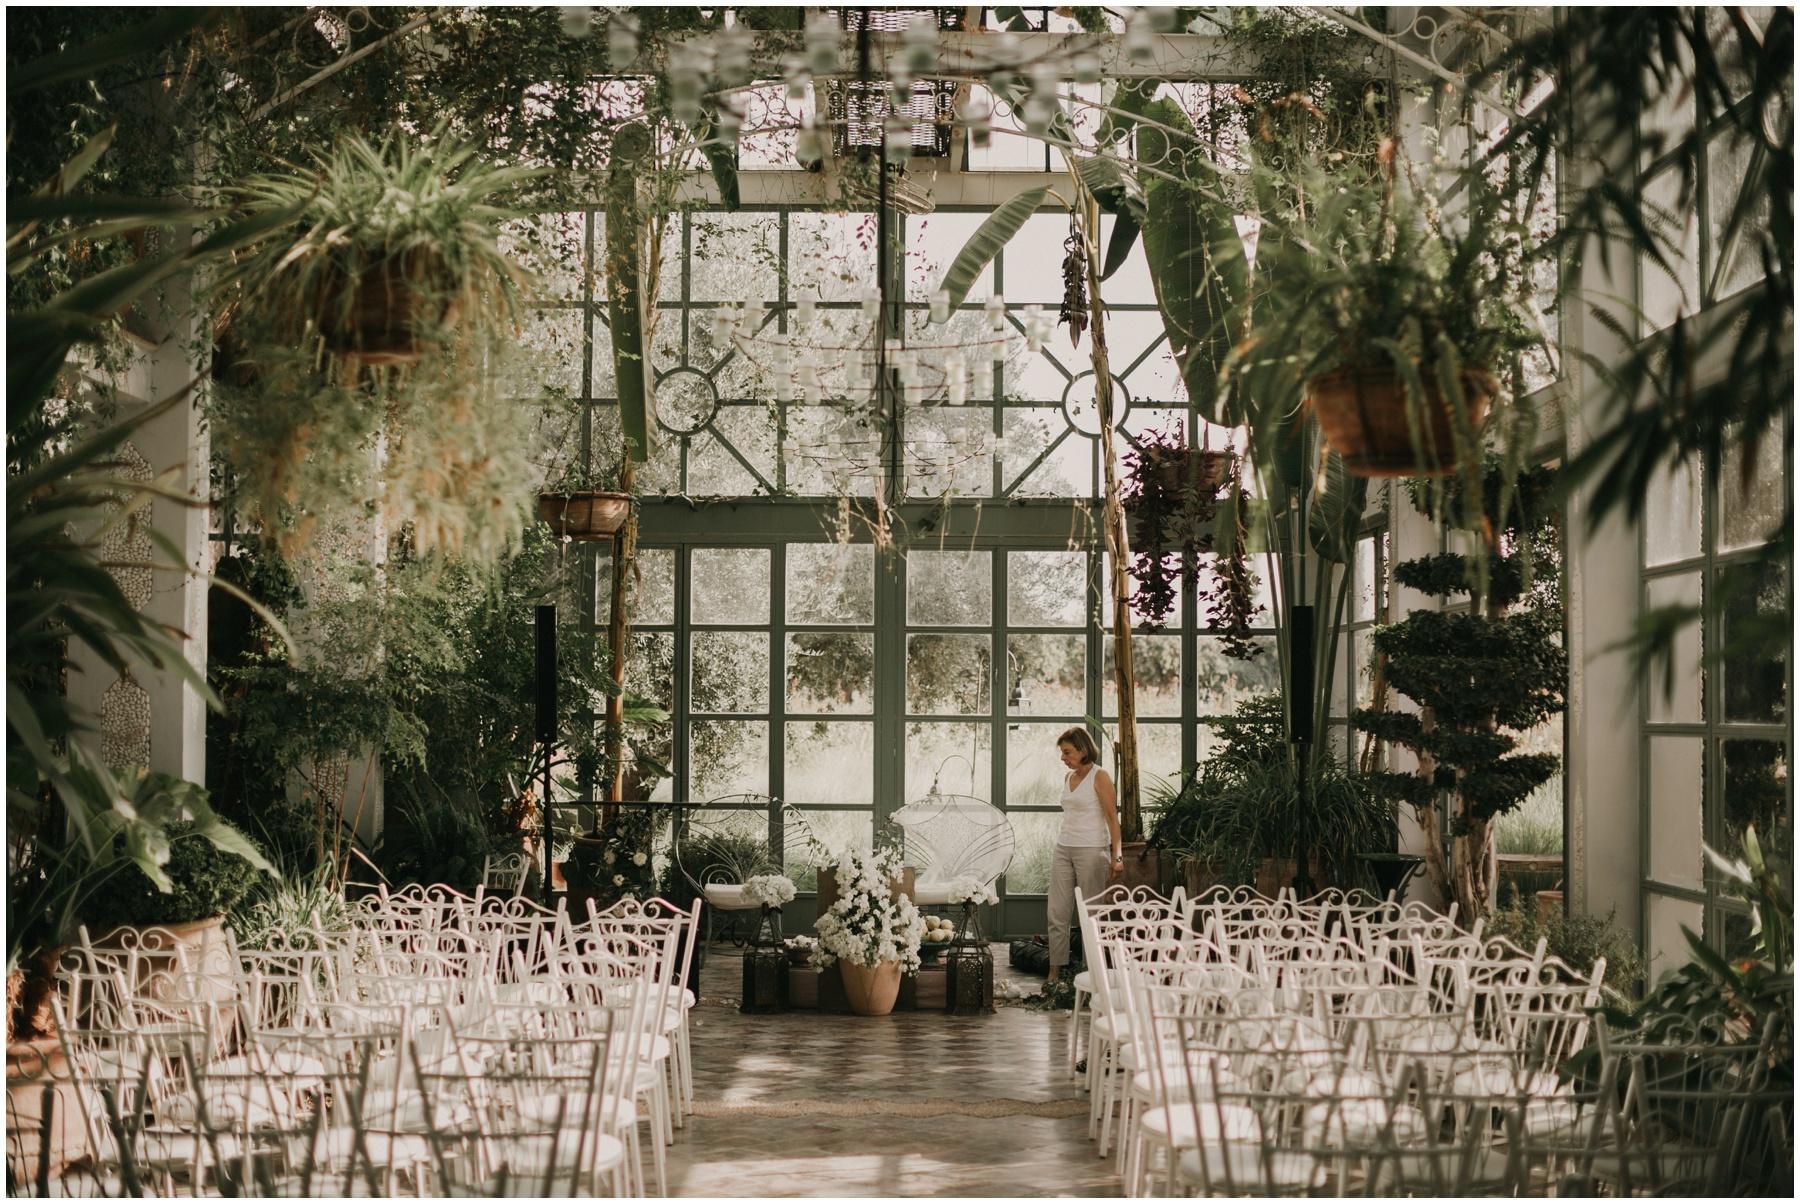 Marrakech Wedding Beldi Coutry Club 006.JPG